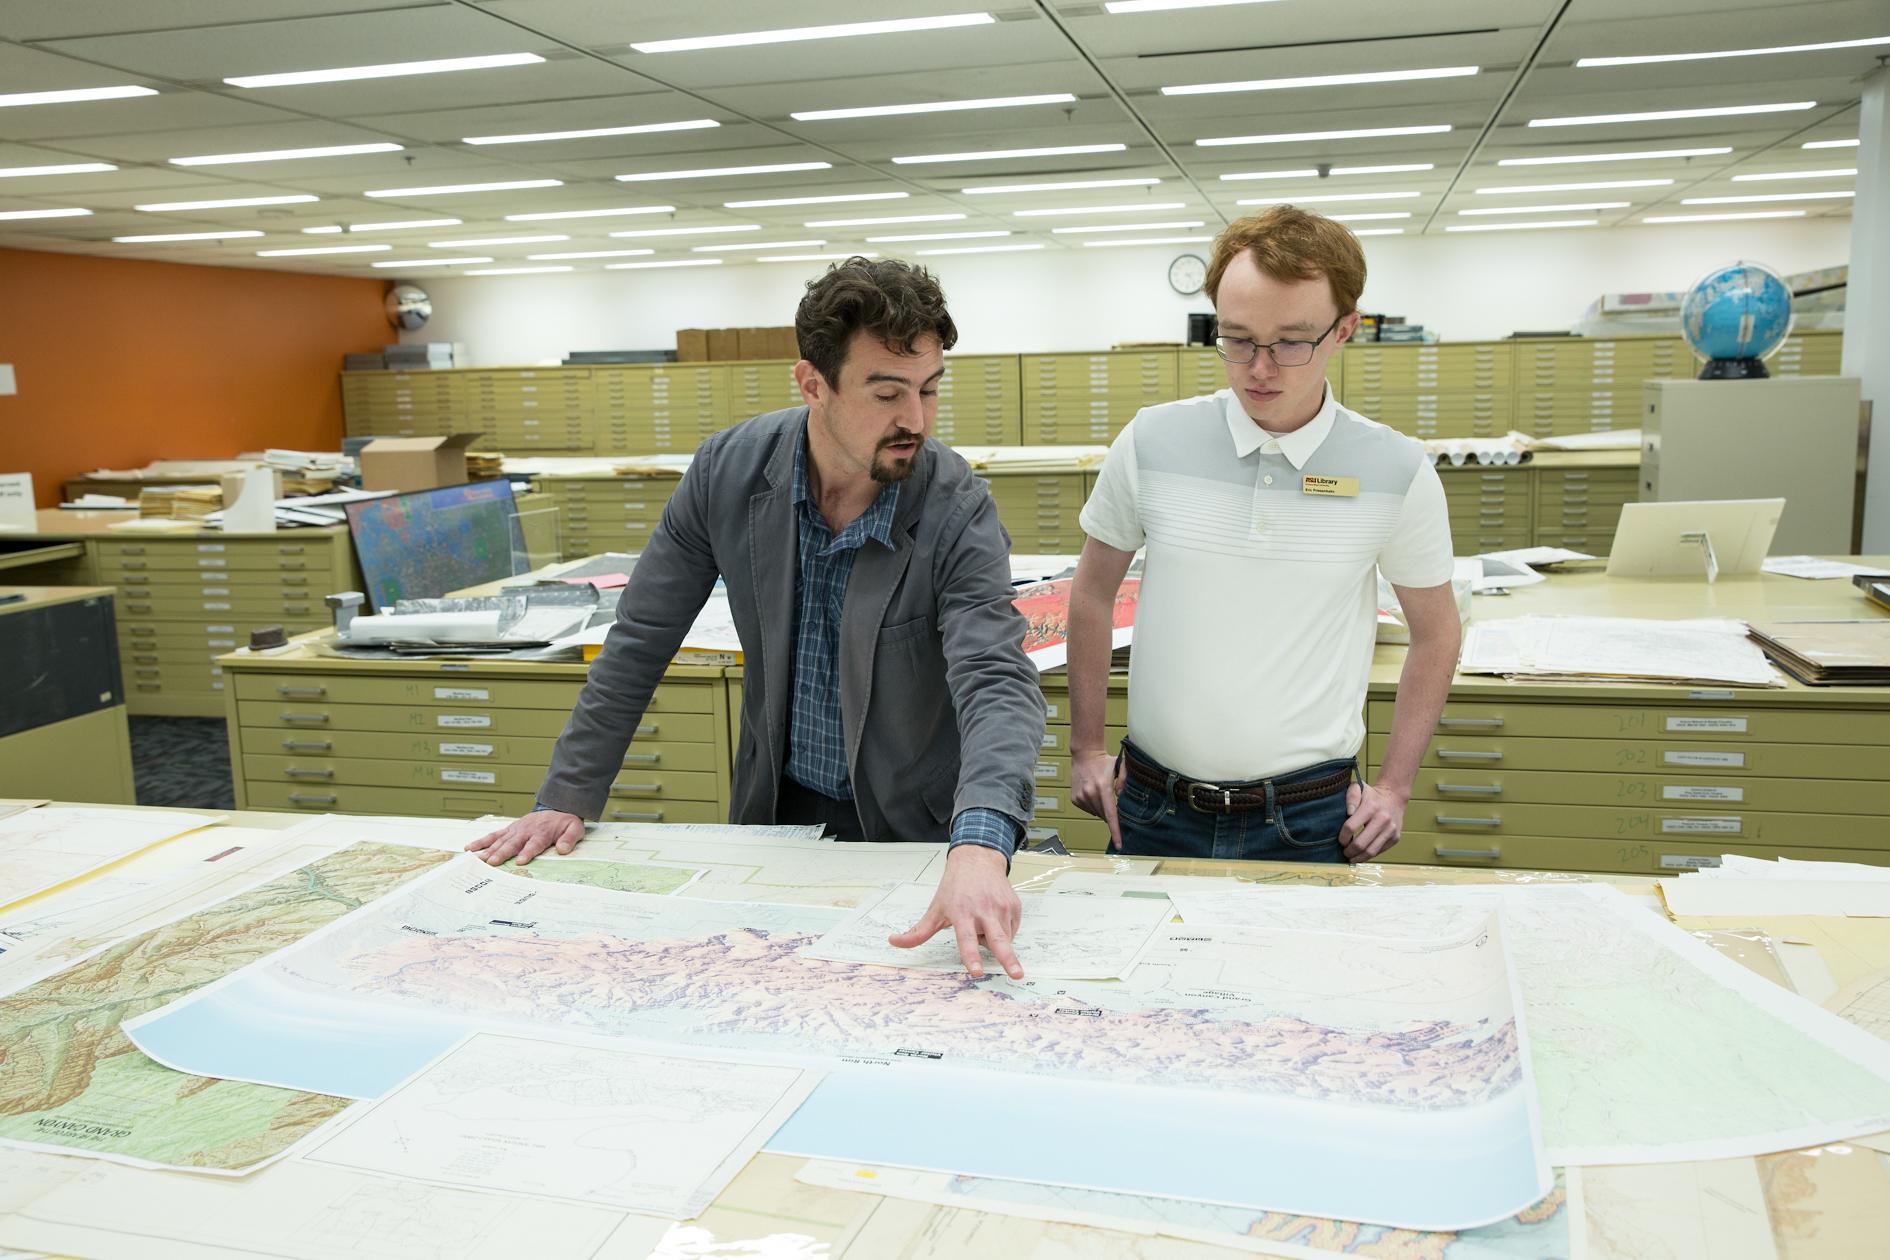 Matt Toro ASU examines Grand Canyon maps